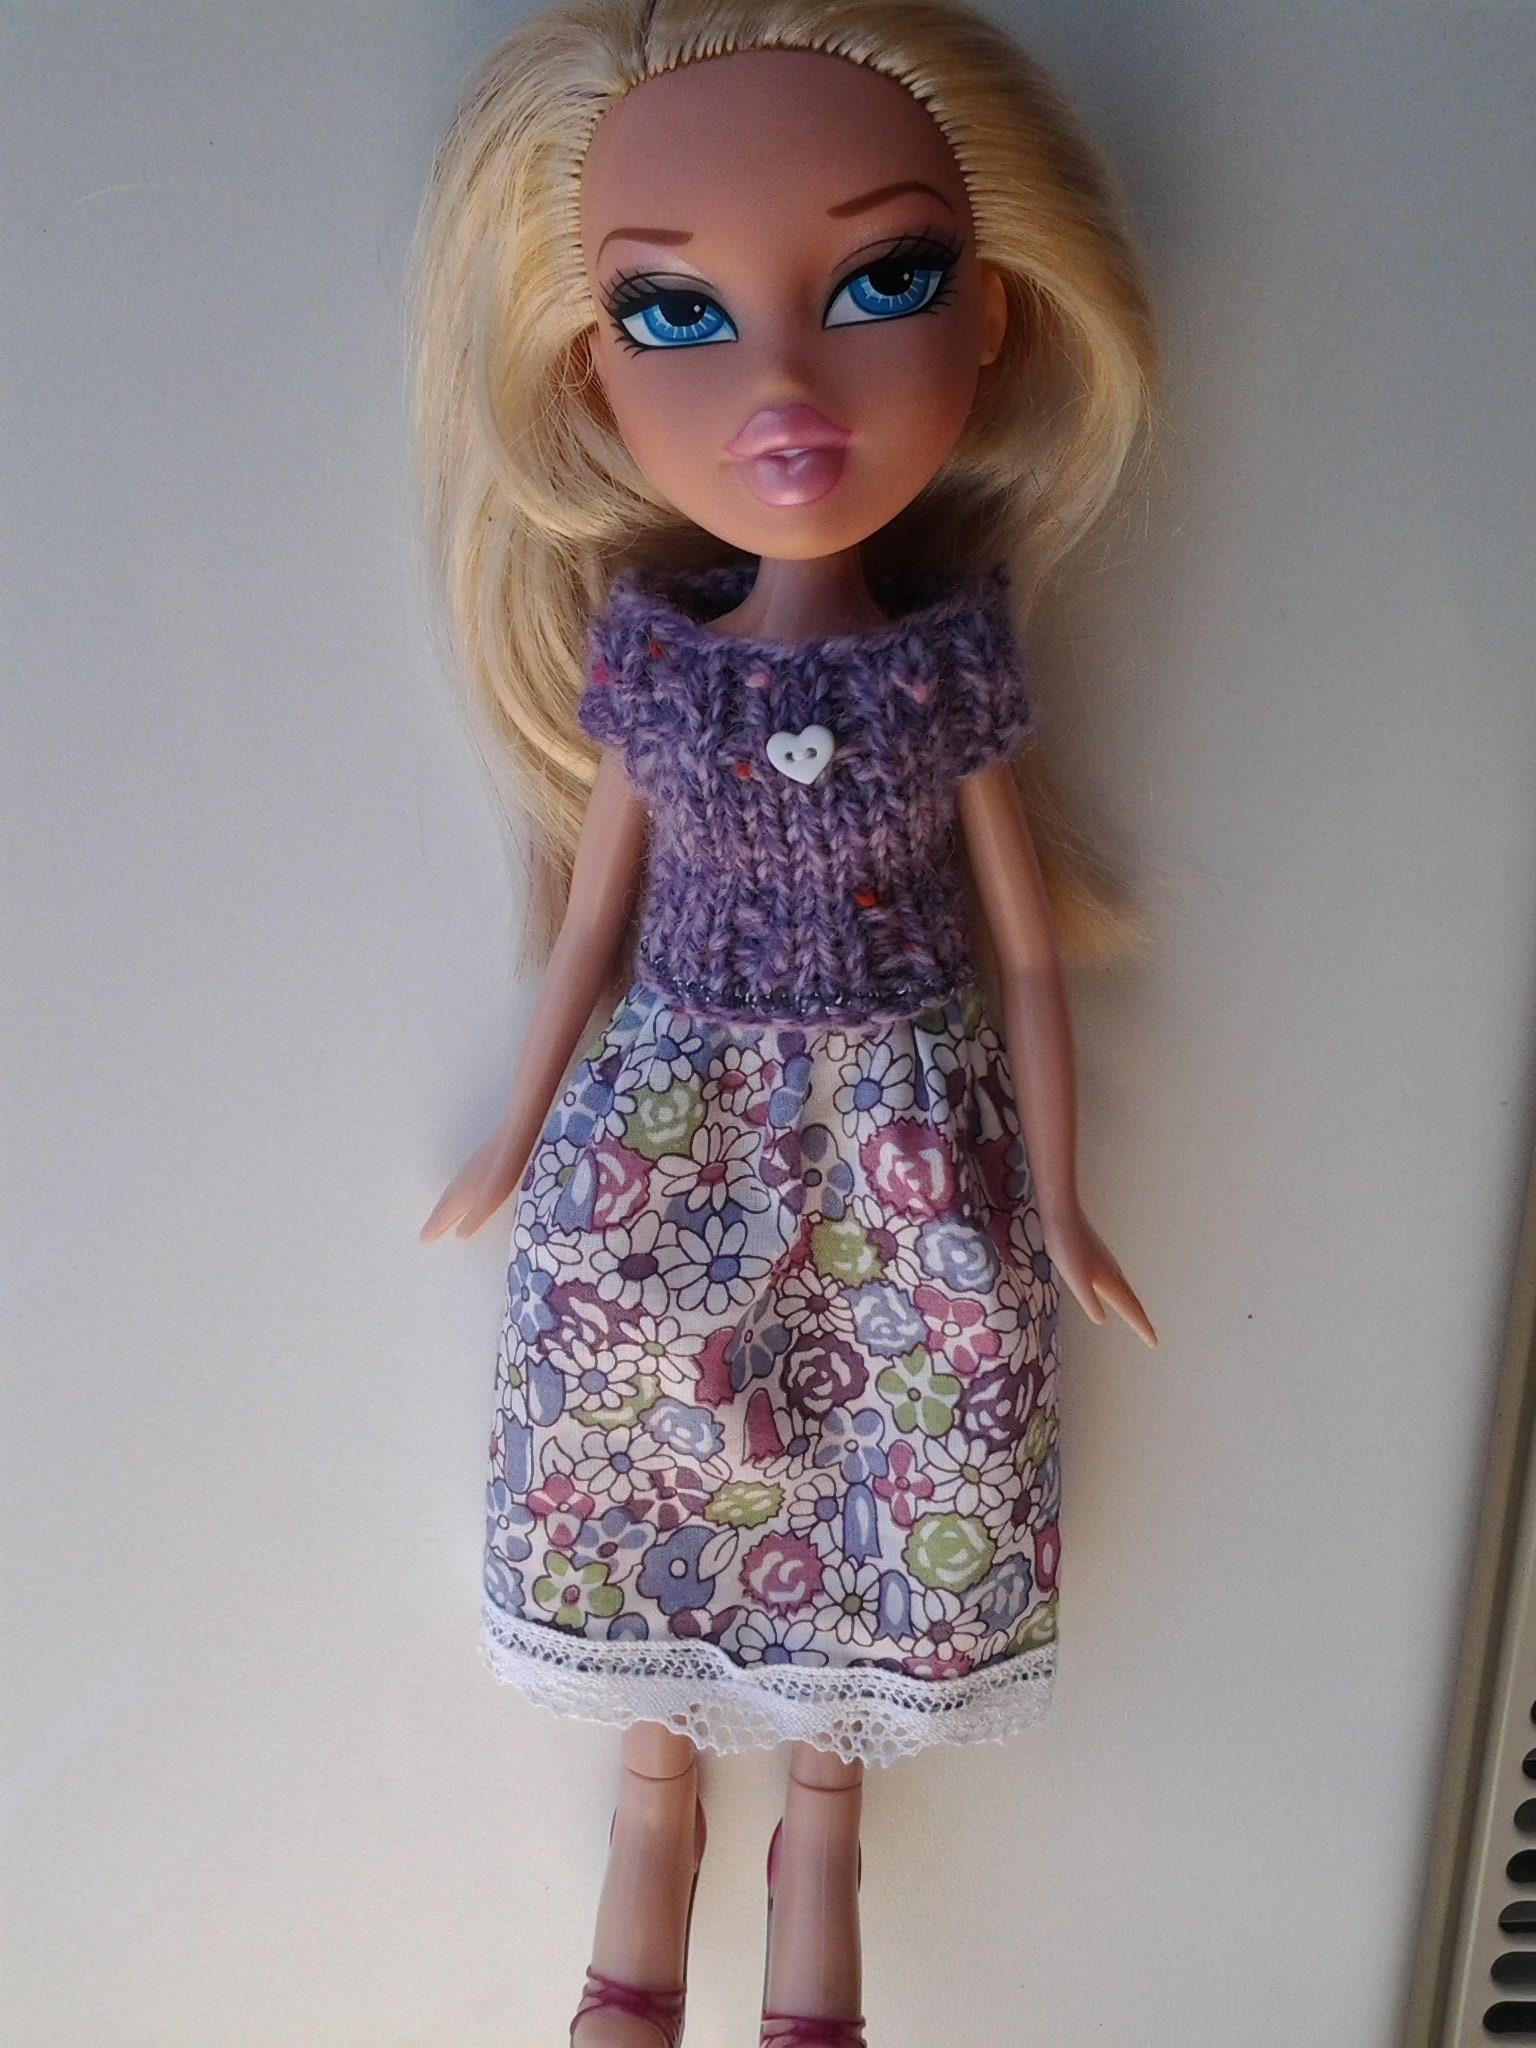 Dress. Bratz doll pullon handmade doll clothes.